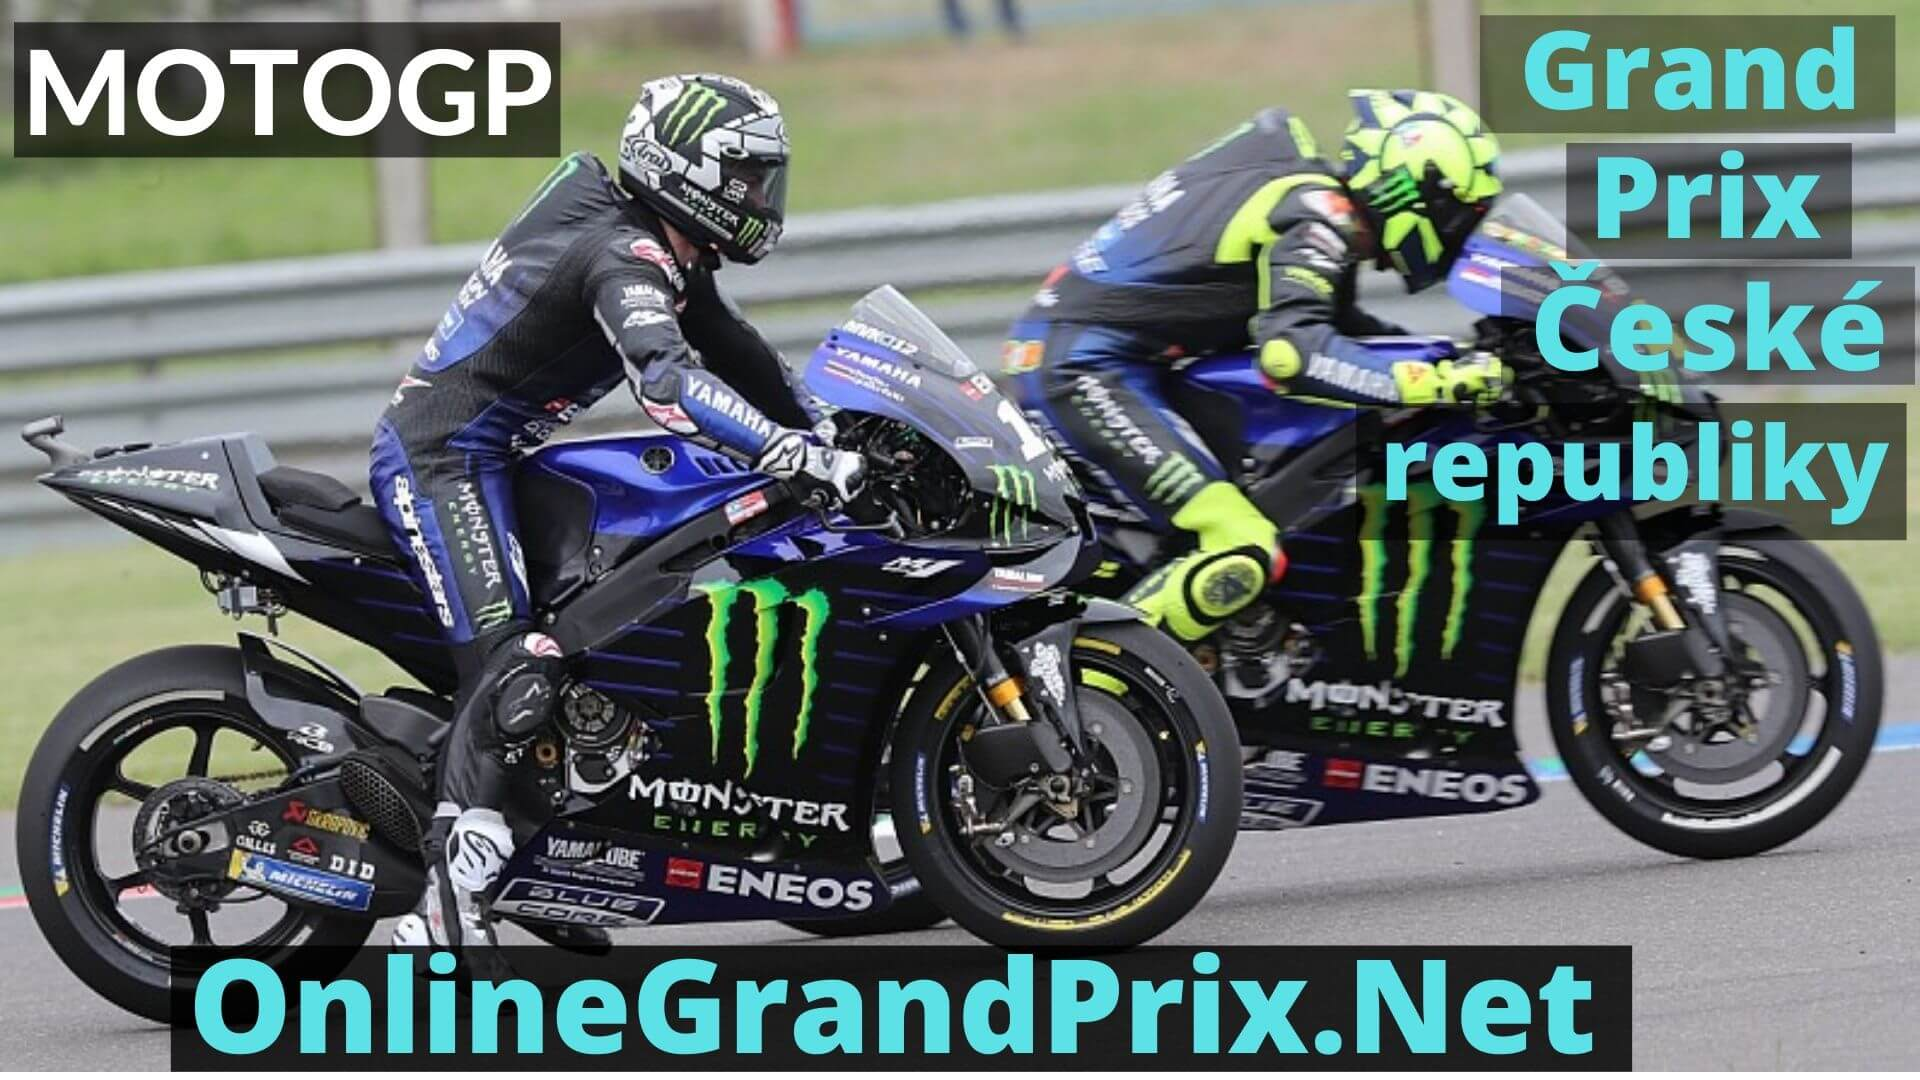 Grand Prix Ceskre republiky Live Stream 2020 | MotoGP